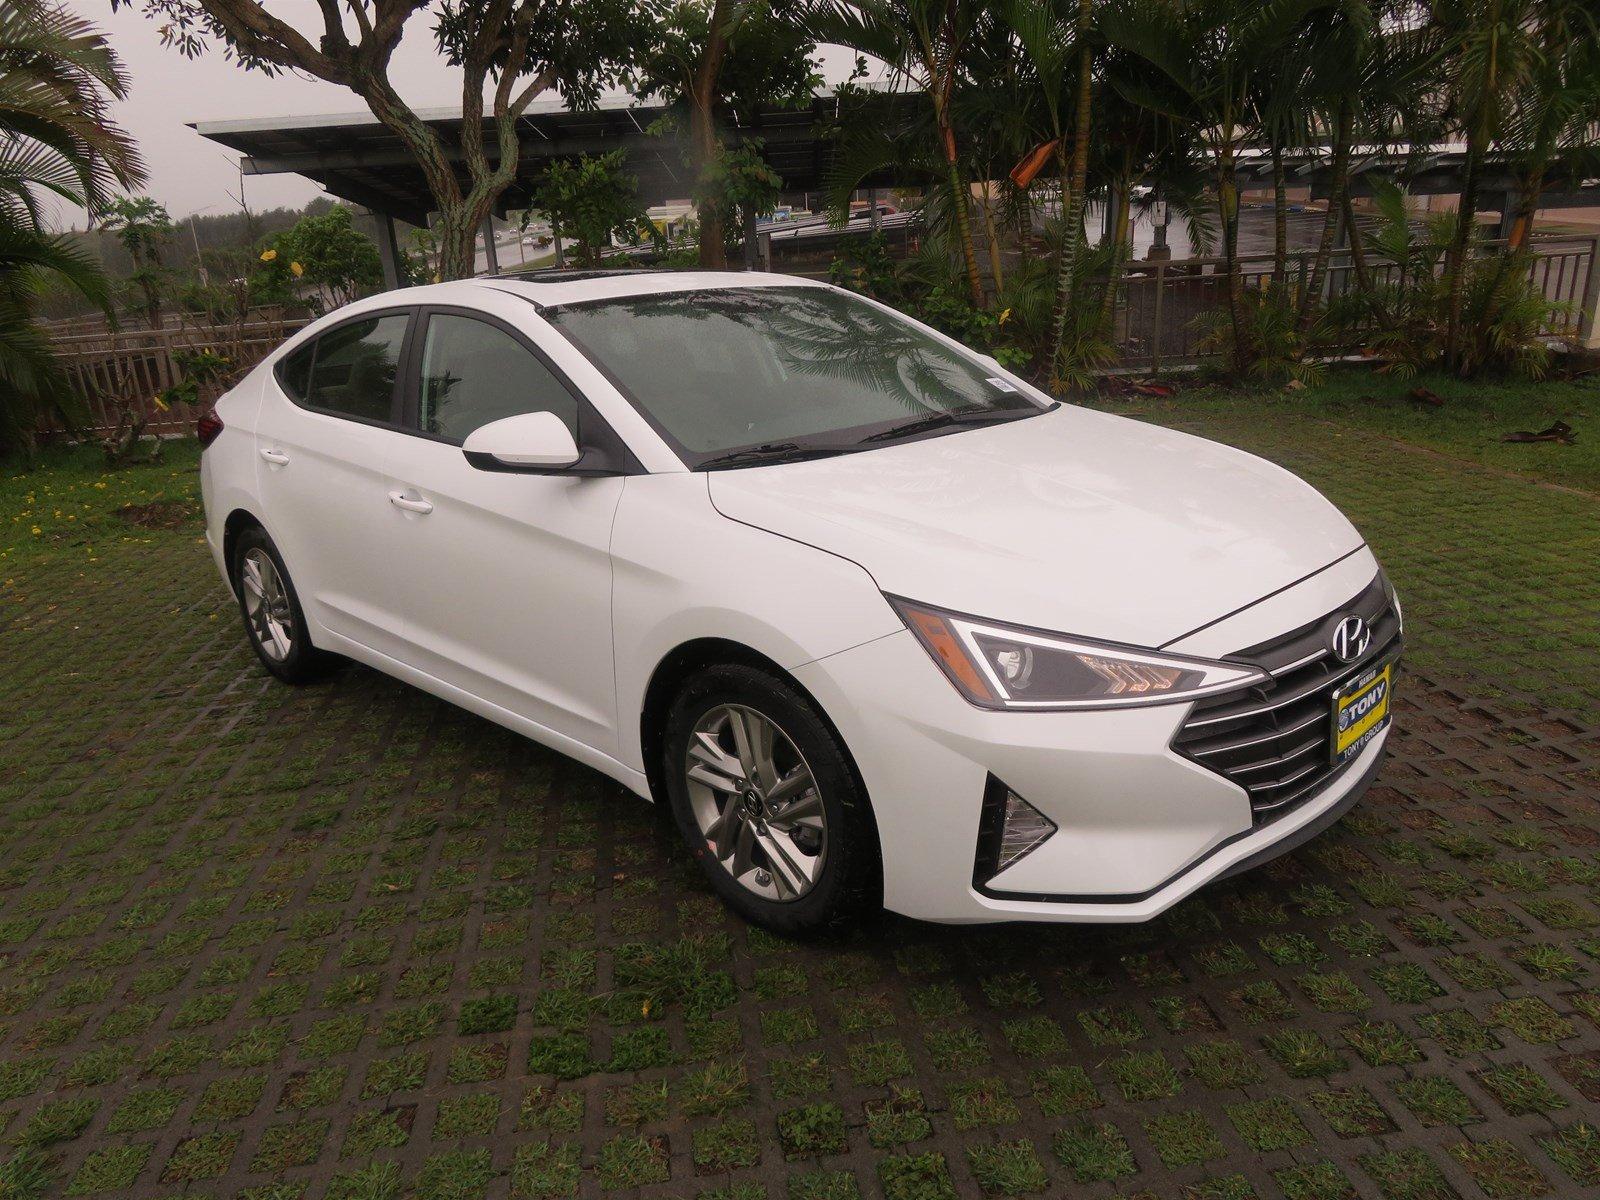 New 2019 Hyundai Elantra Value Edition For Sale in Waipahu HI | VIN:  5NPD84LFXKH472388